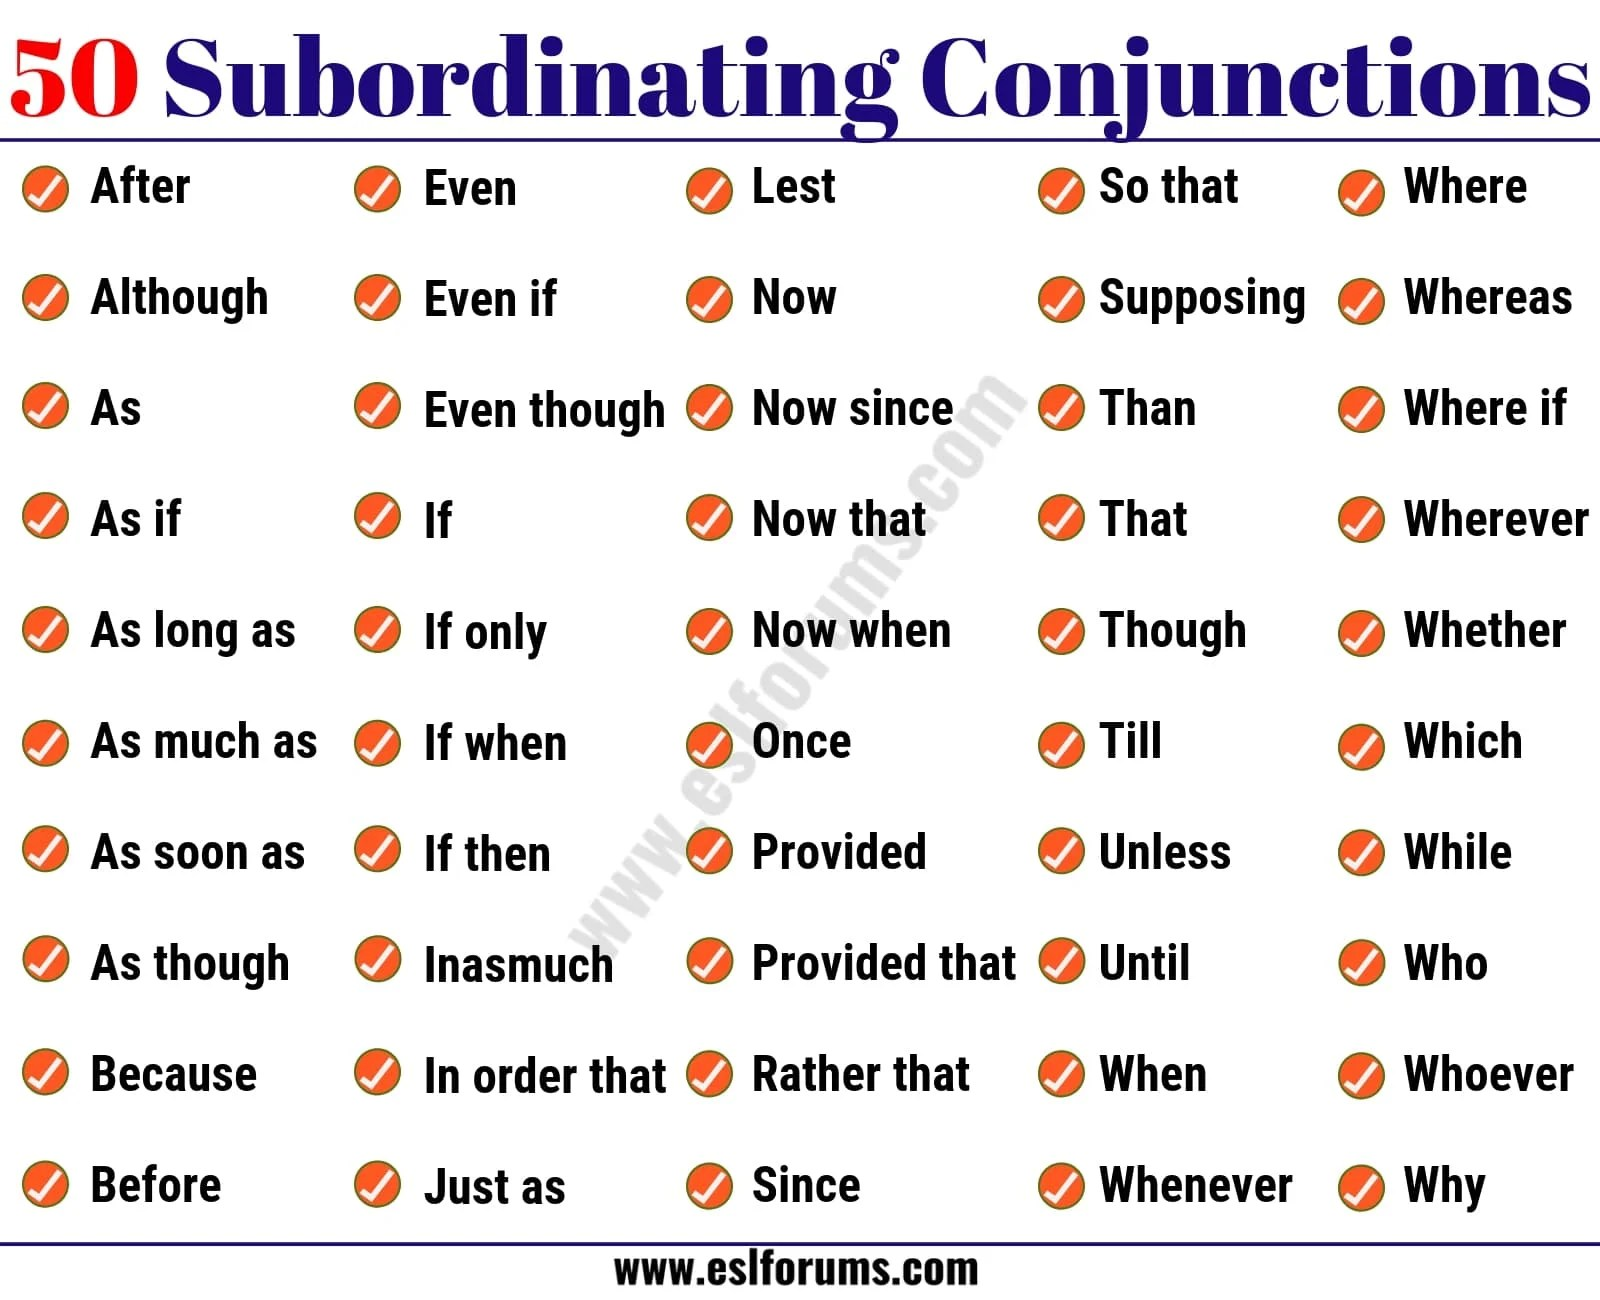 50 Important Subordinating Conjunctions In English Grammar